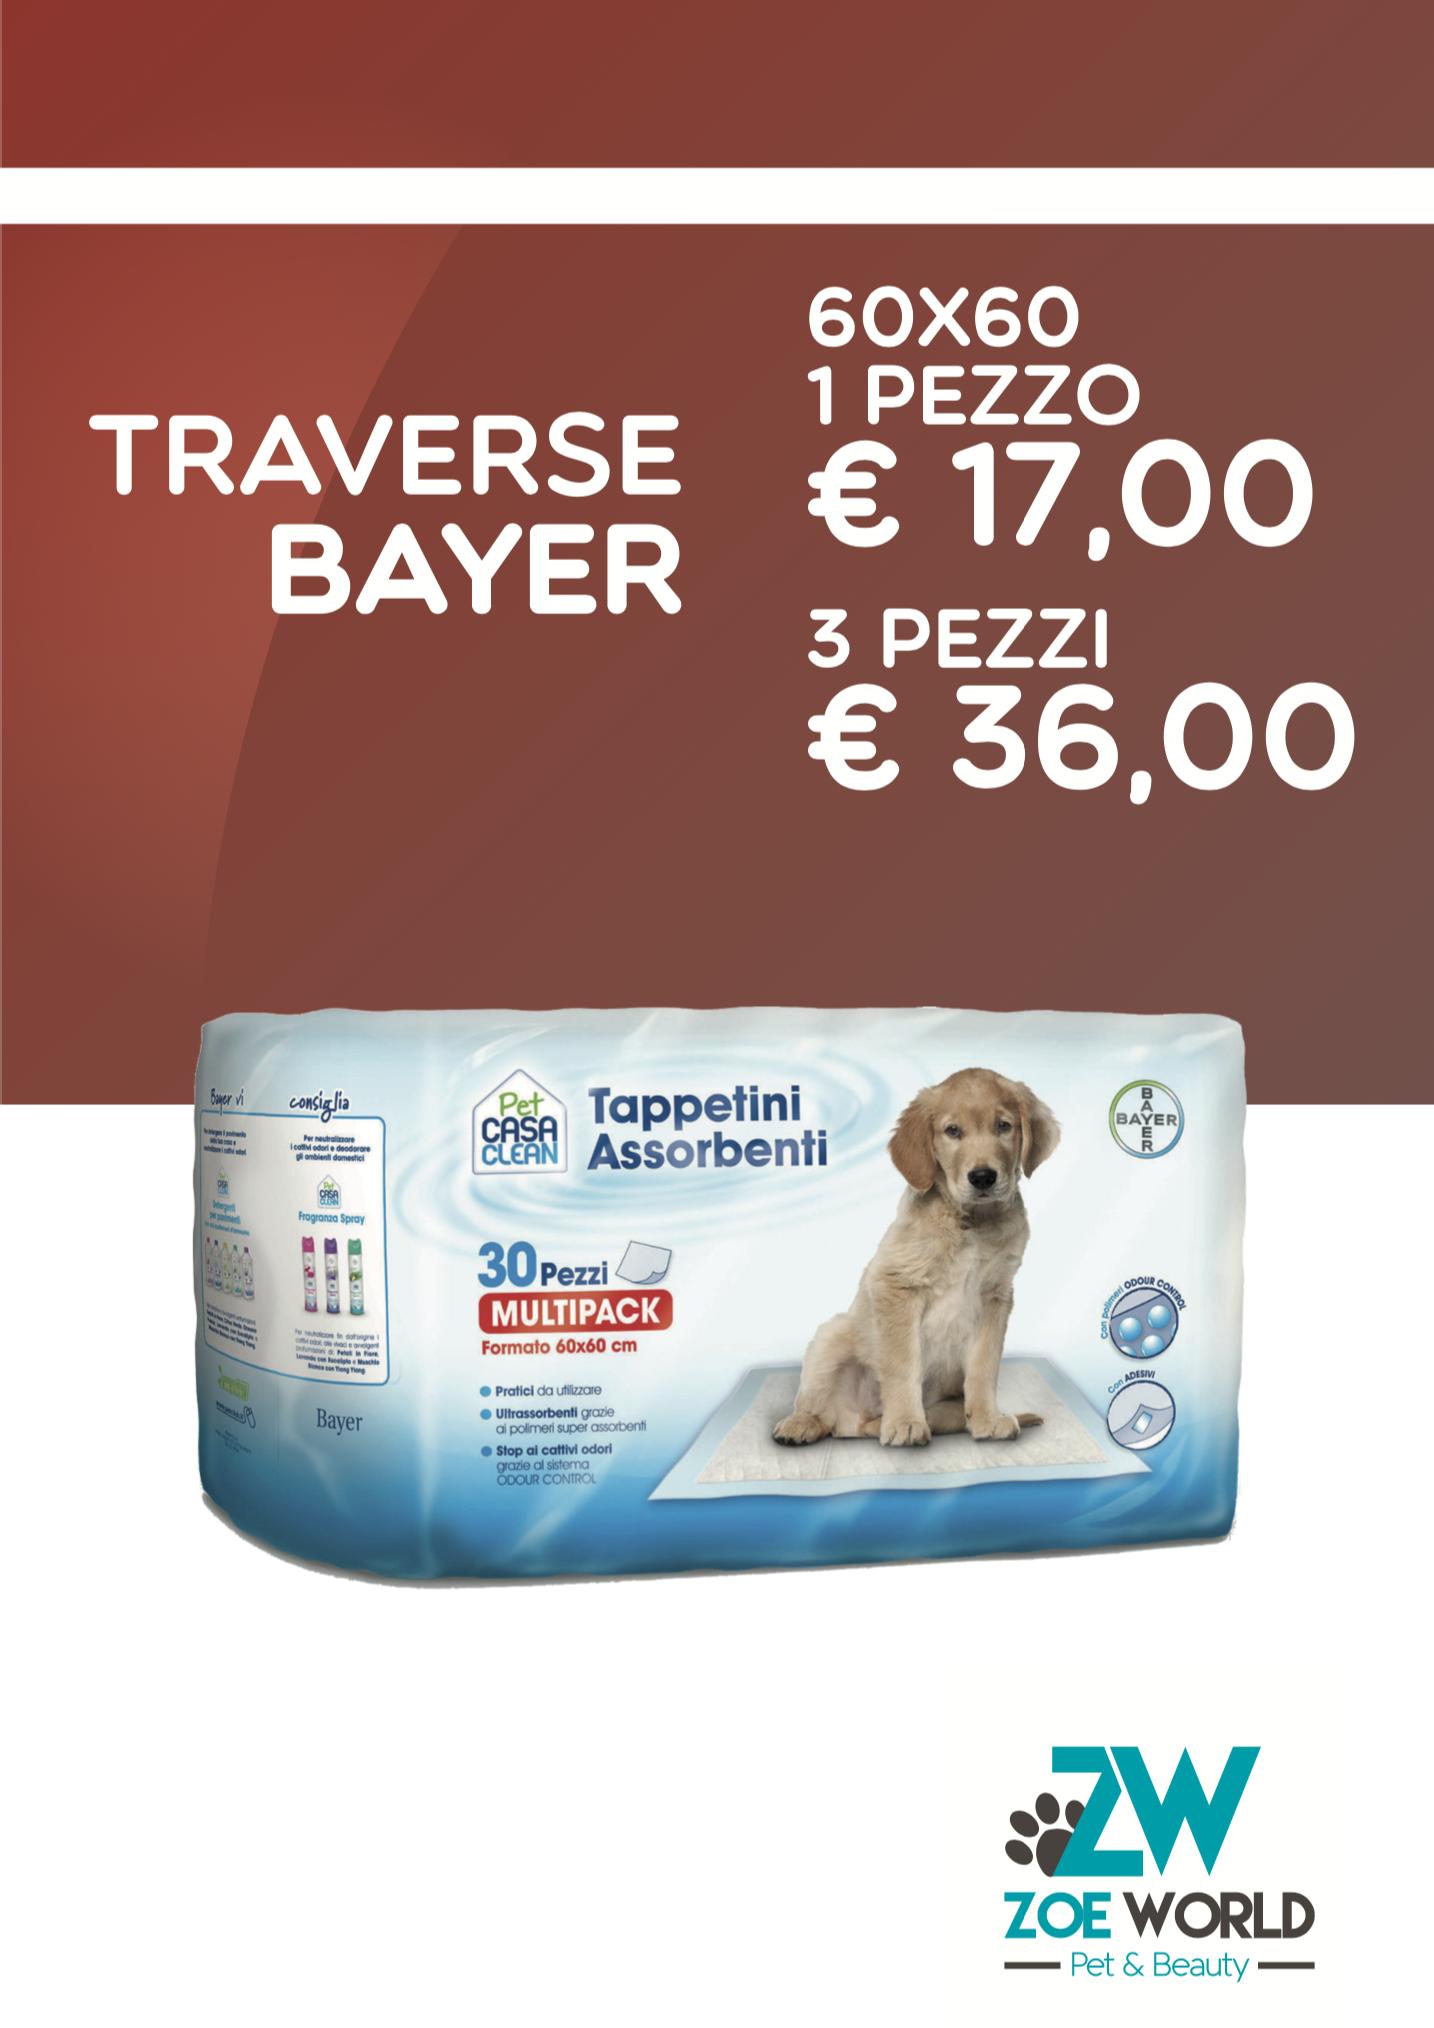 Traverse Bayer